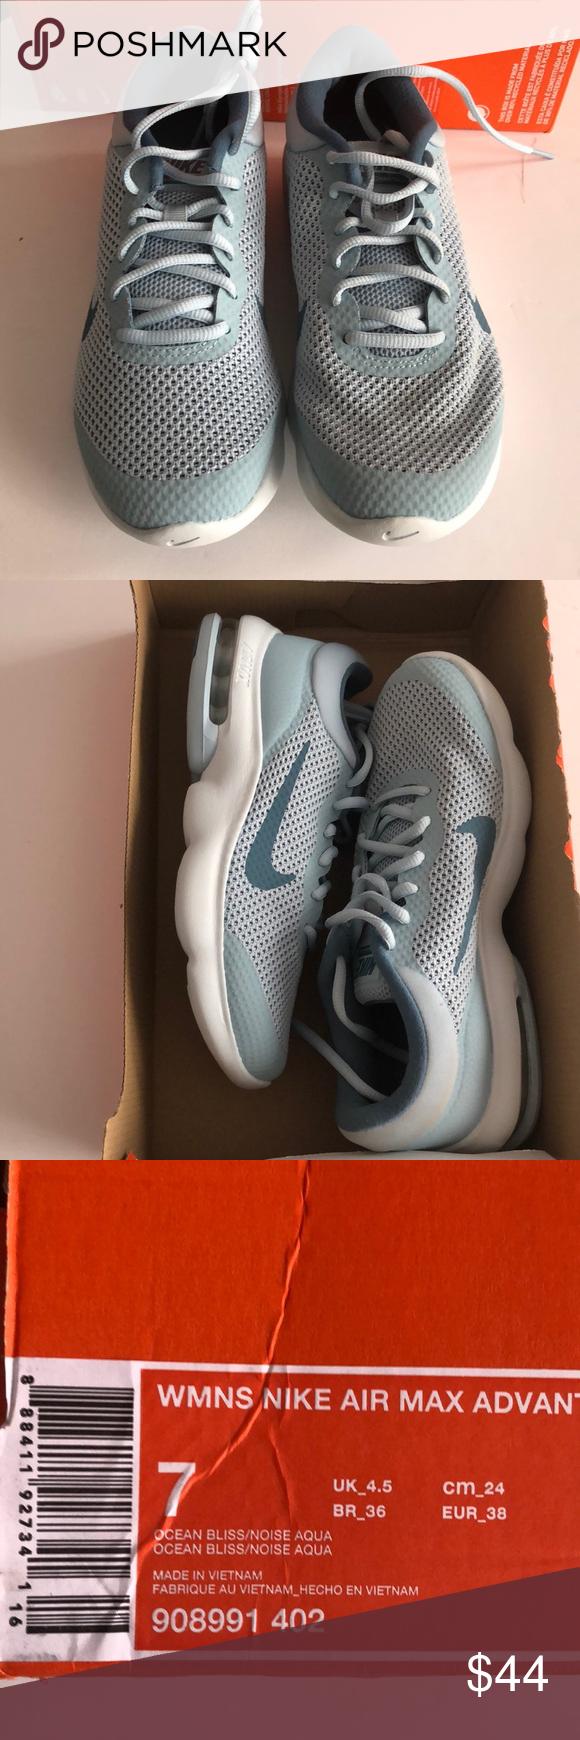 9e26ea7f1e8d5d Women s Nike Air Max advantage Women s Nike air max advantage size 7 color  light blue style   908991 402 Nike Shoes Athletic Shoes